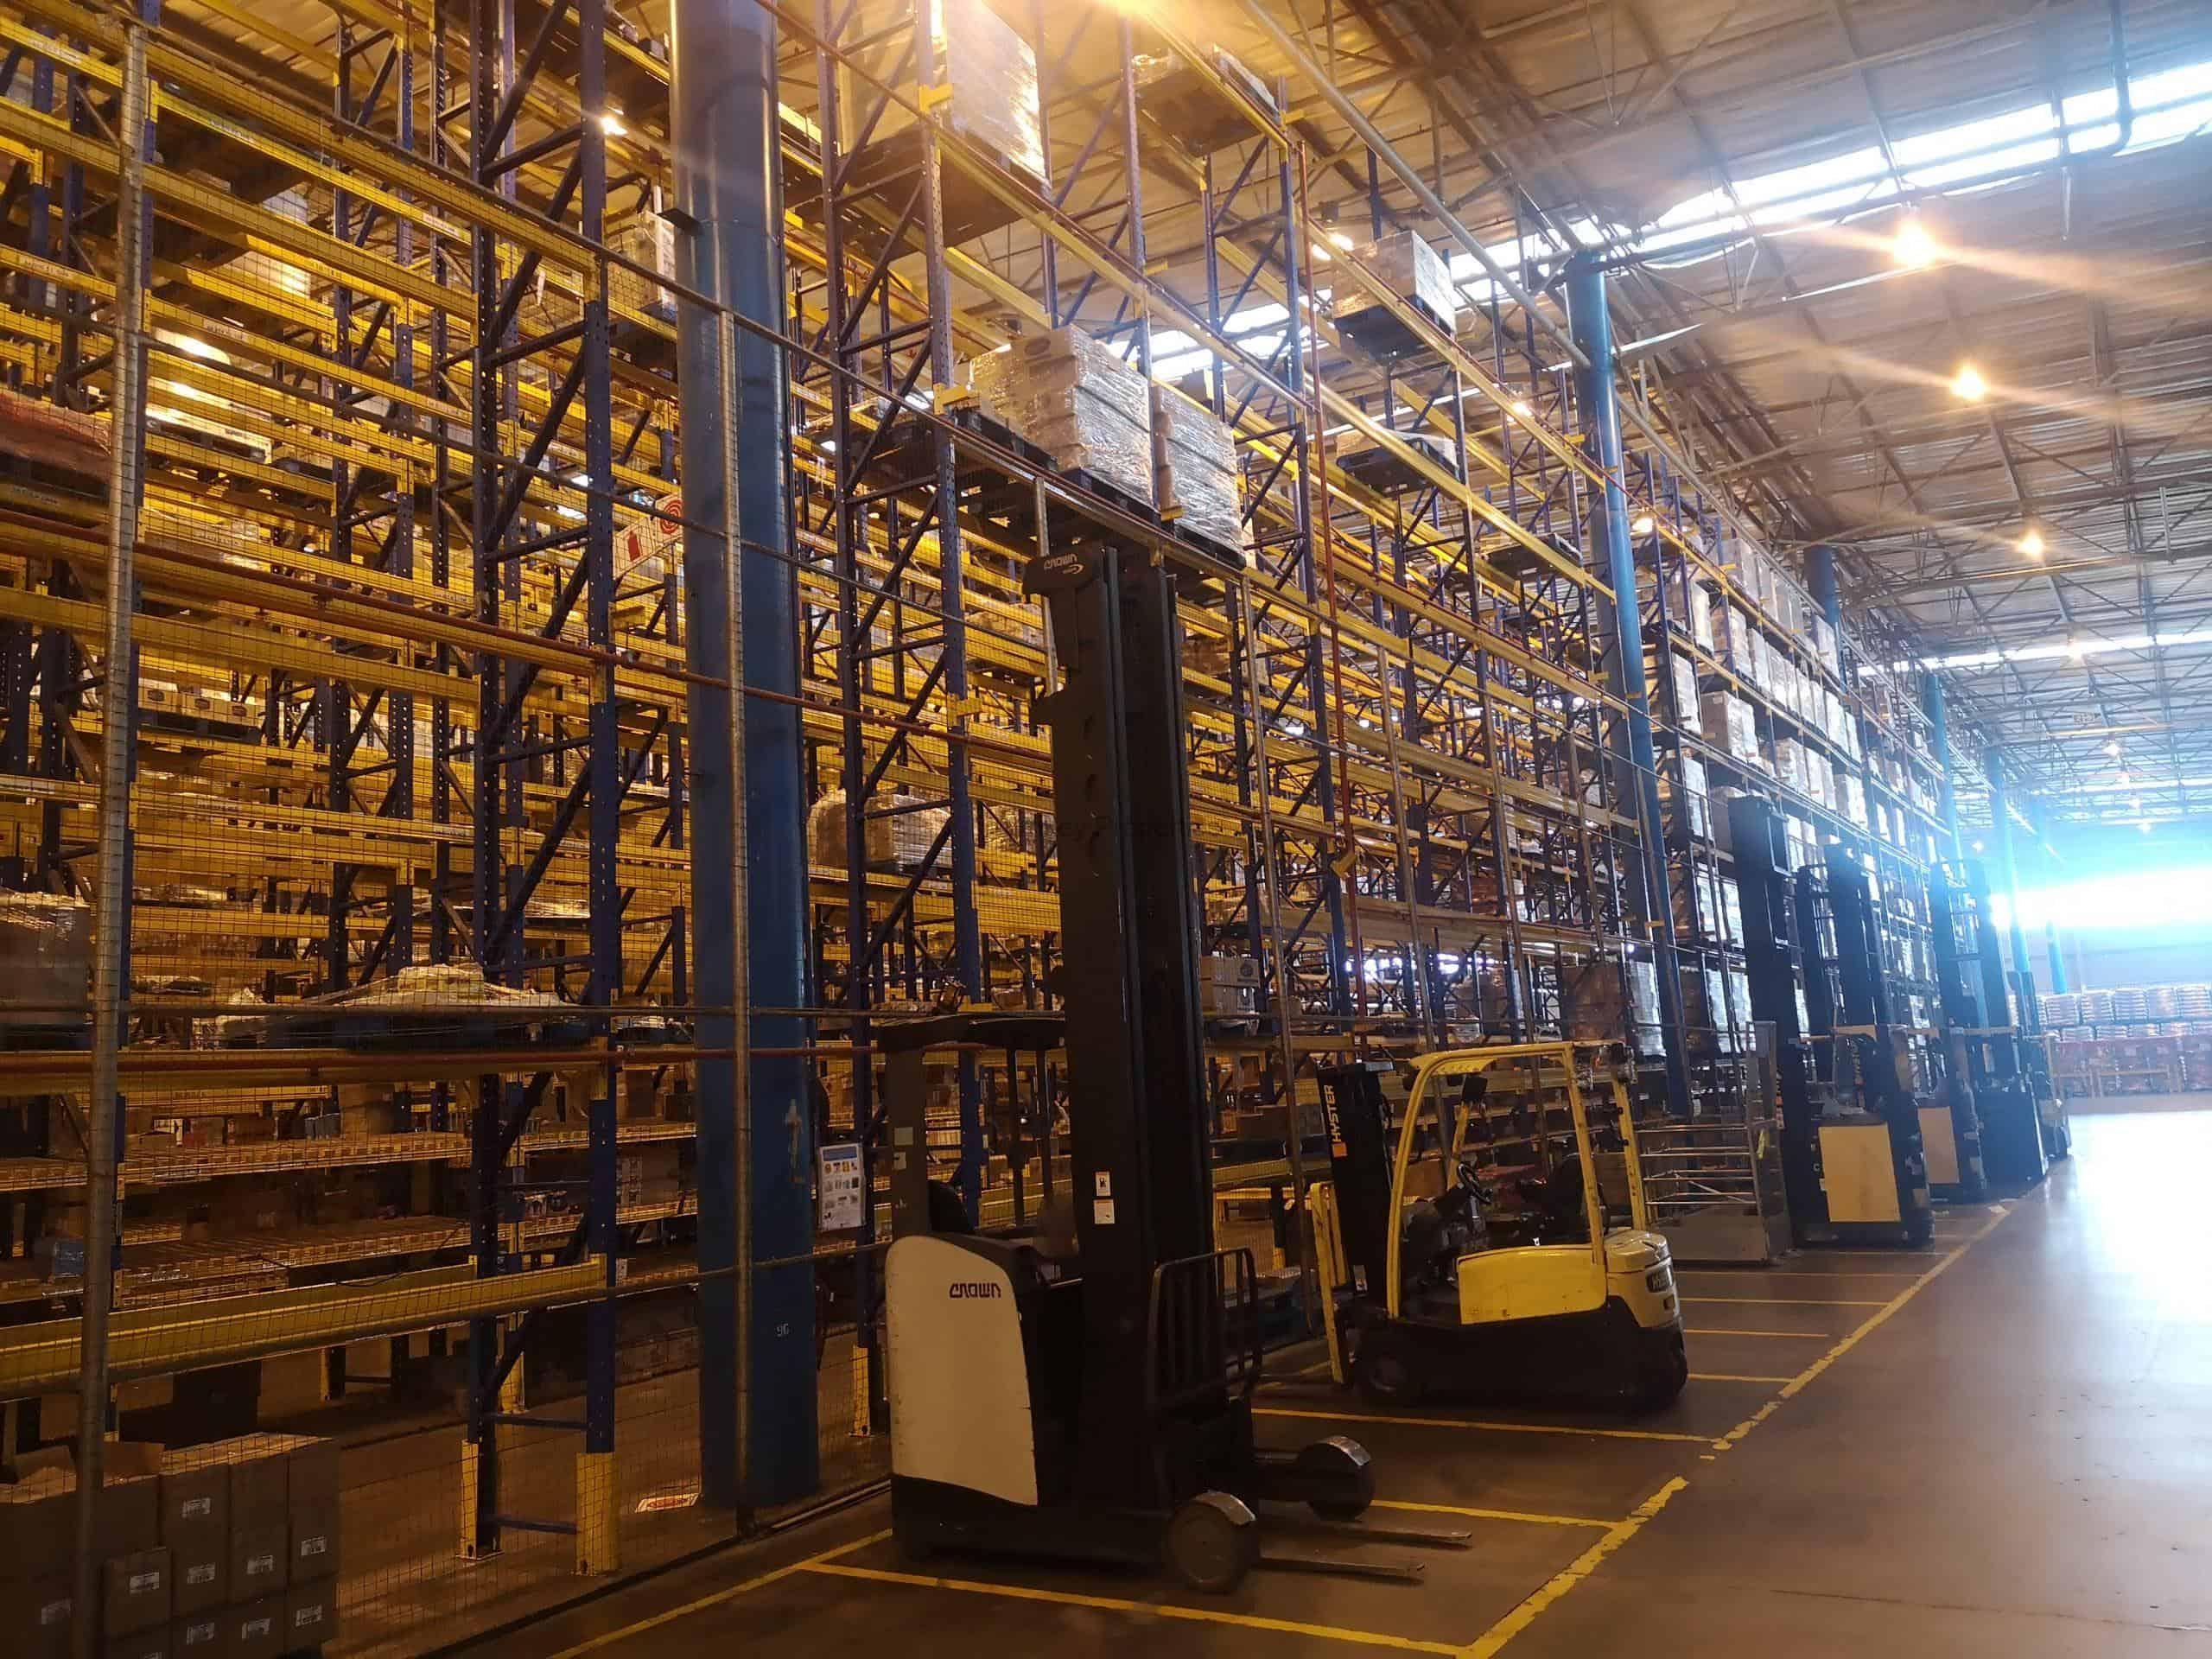 33000 m² Warehouse space to Rent Denver 65 Mimetes